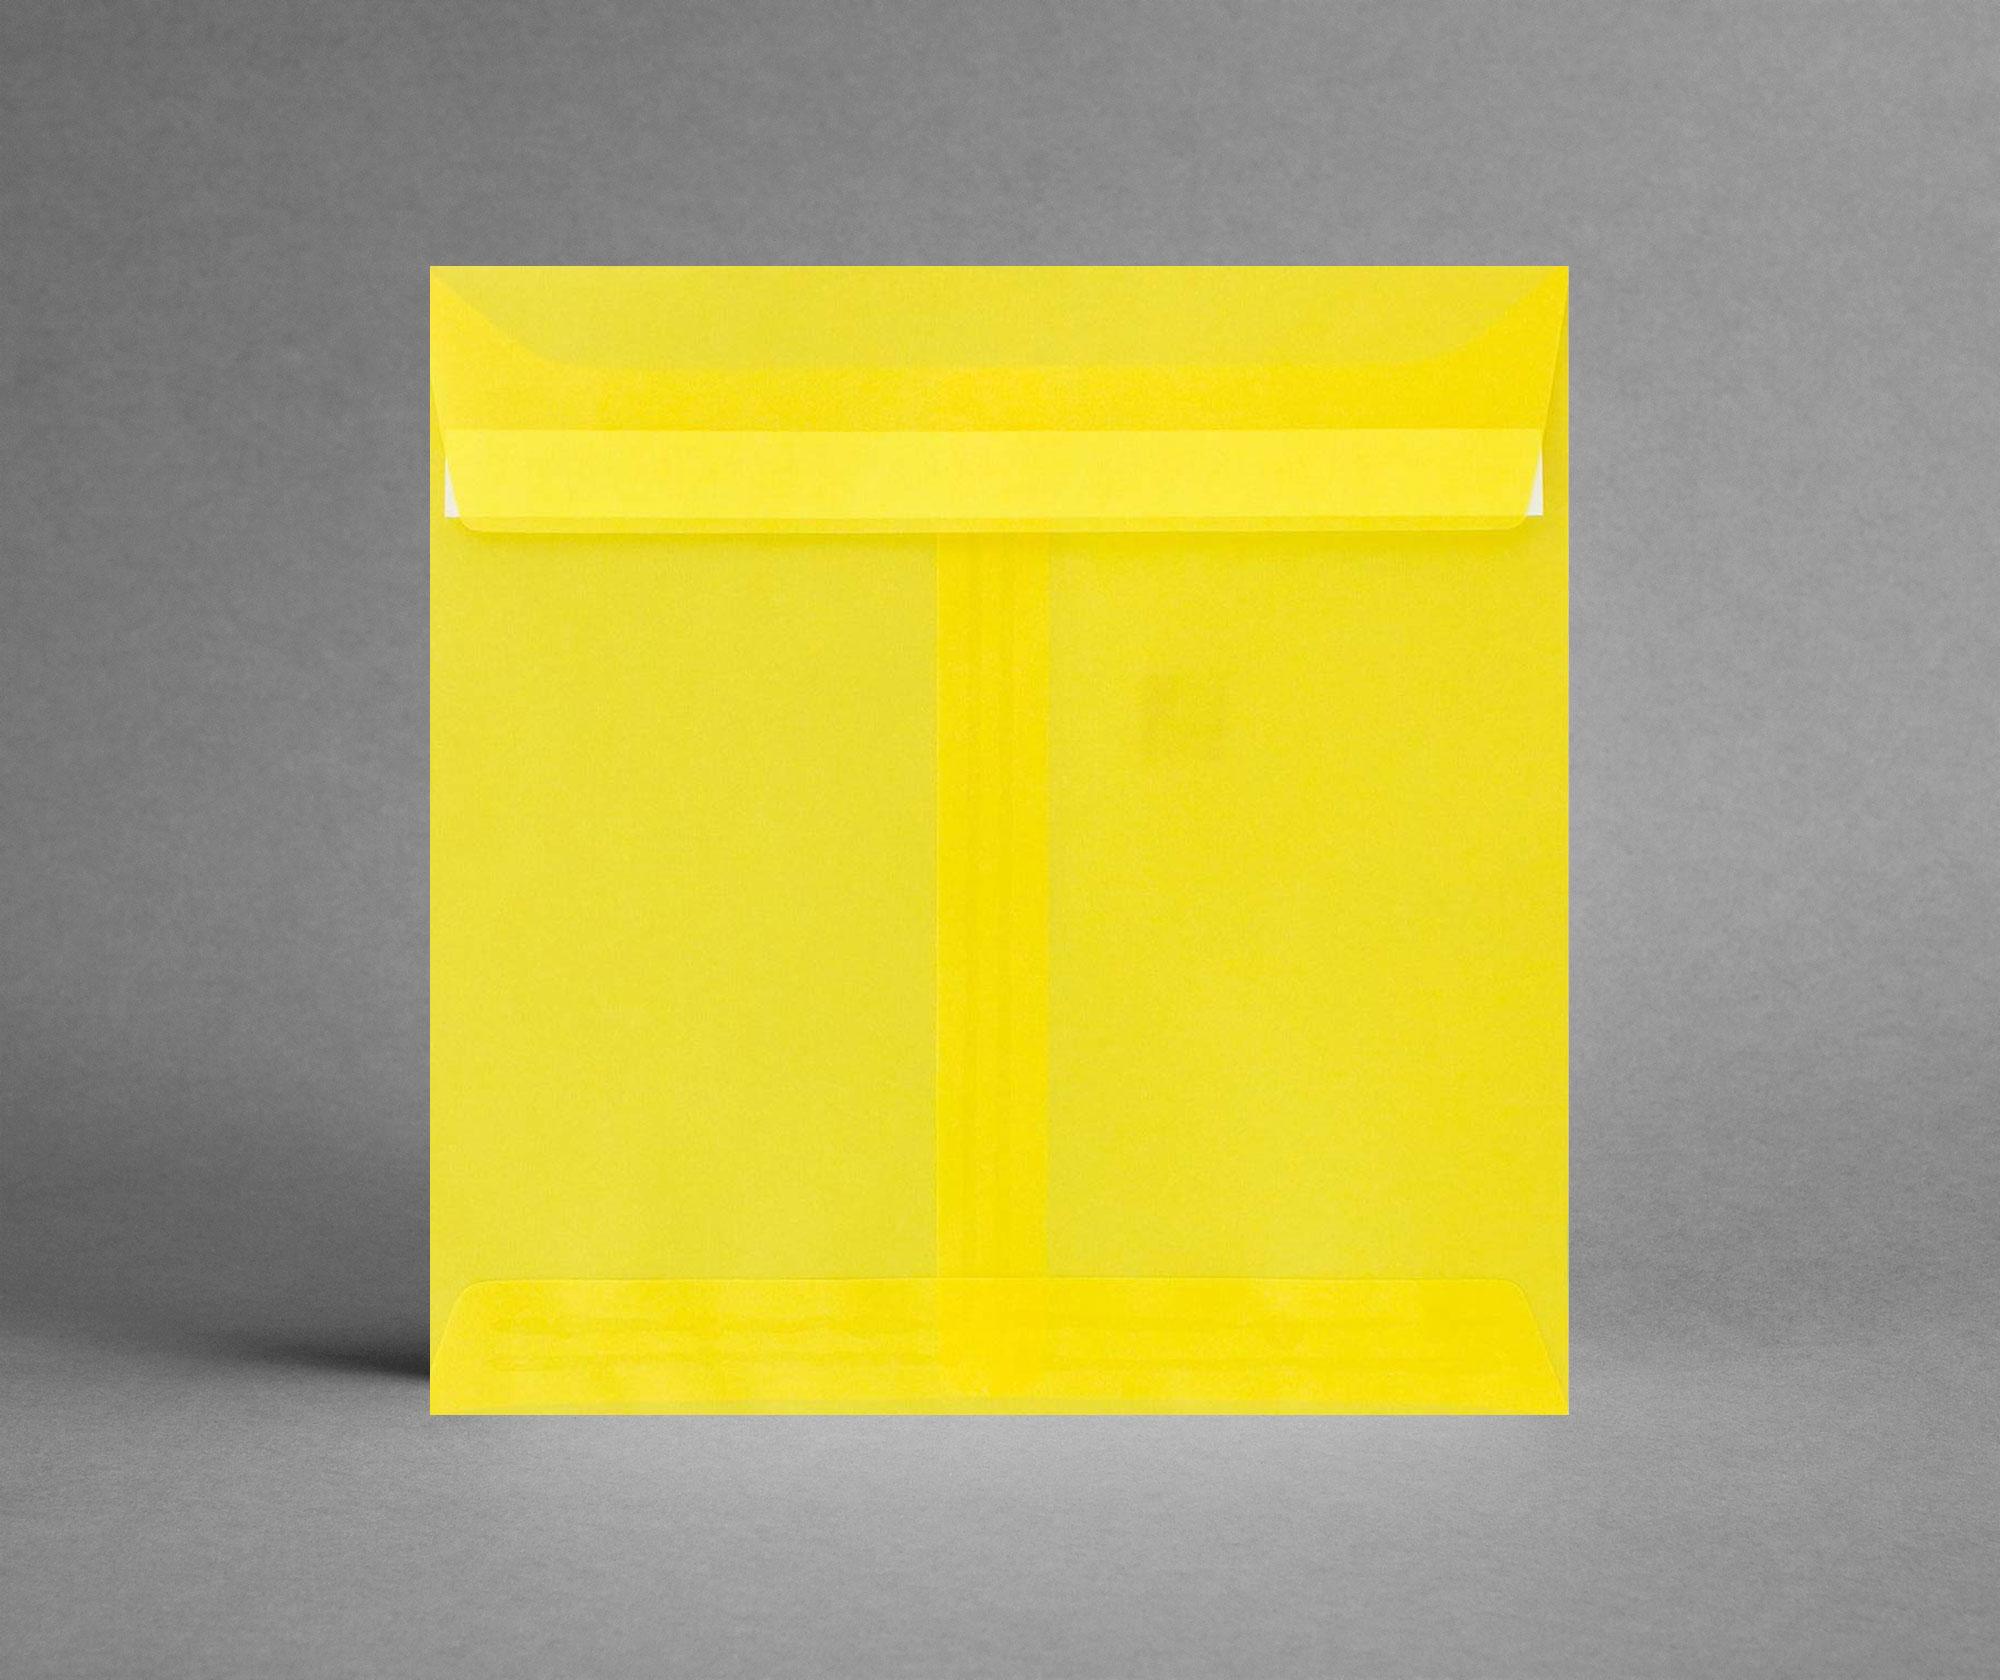 Kuvert_quadratisch_transparent_gelb_grusskarten-design7iYKjEFhP1lN2